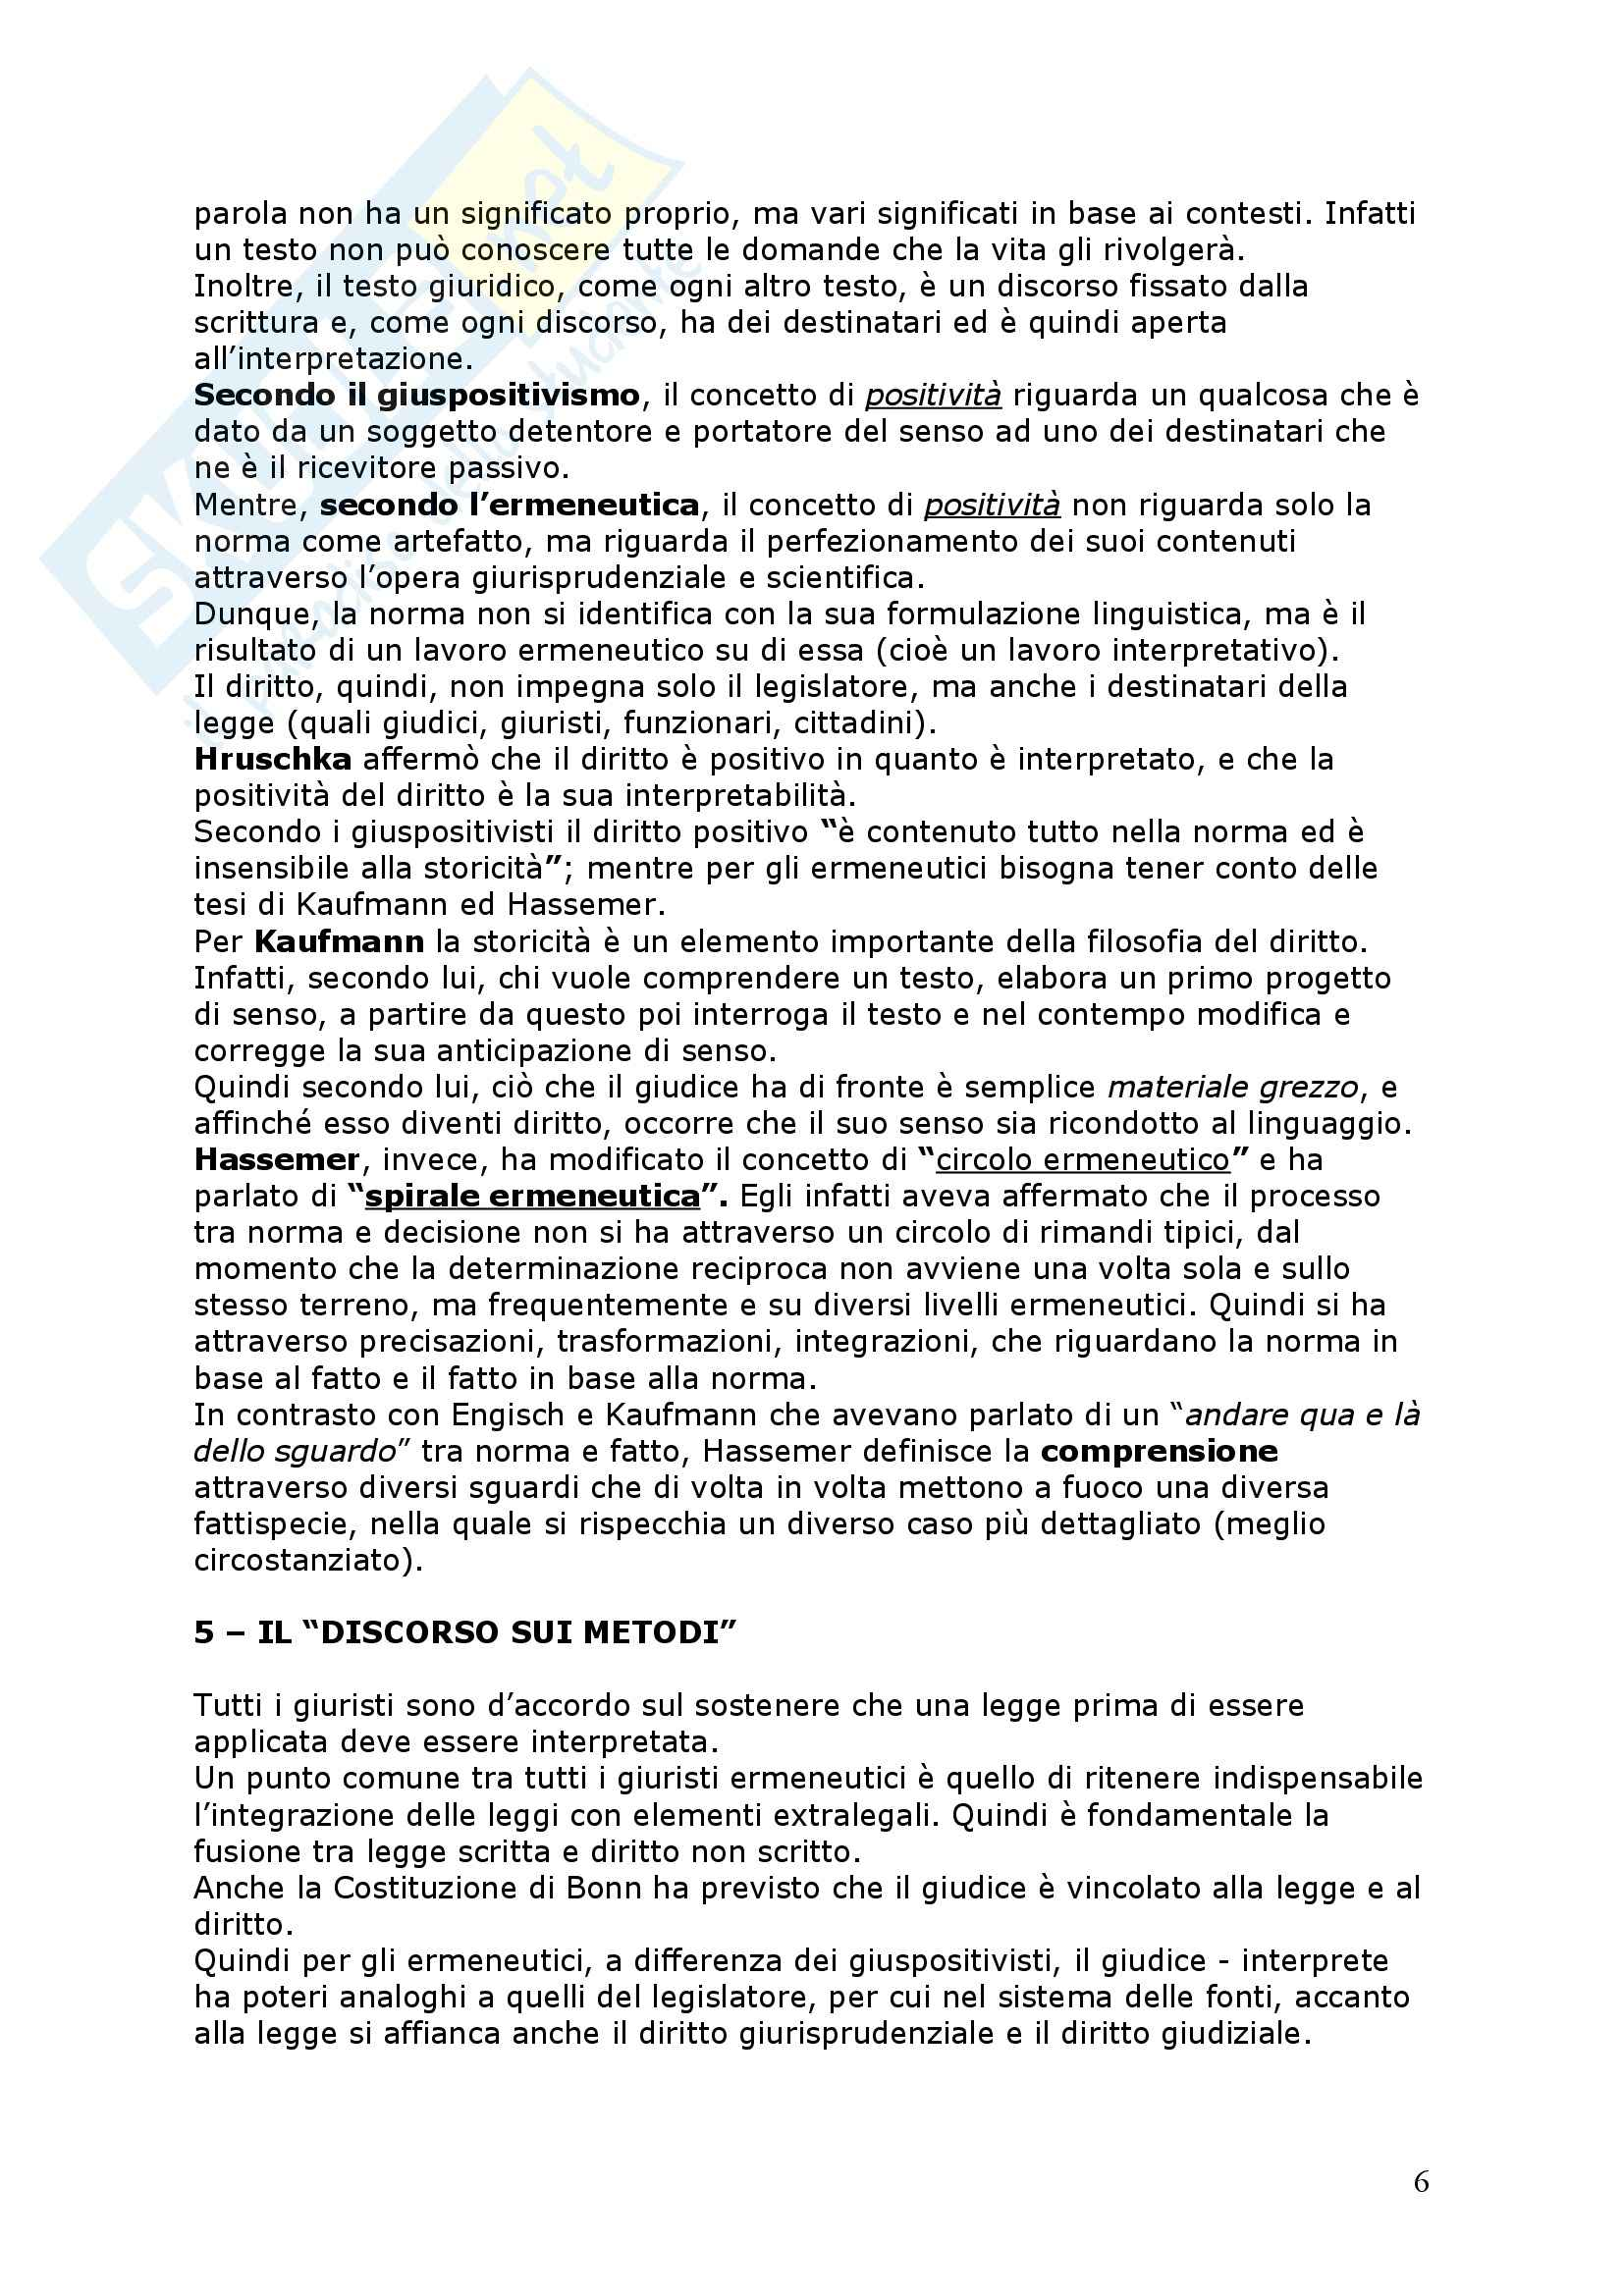 Positivismo giuridico ed ermeneutica filosofica Pag. 6